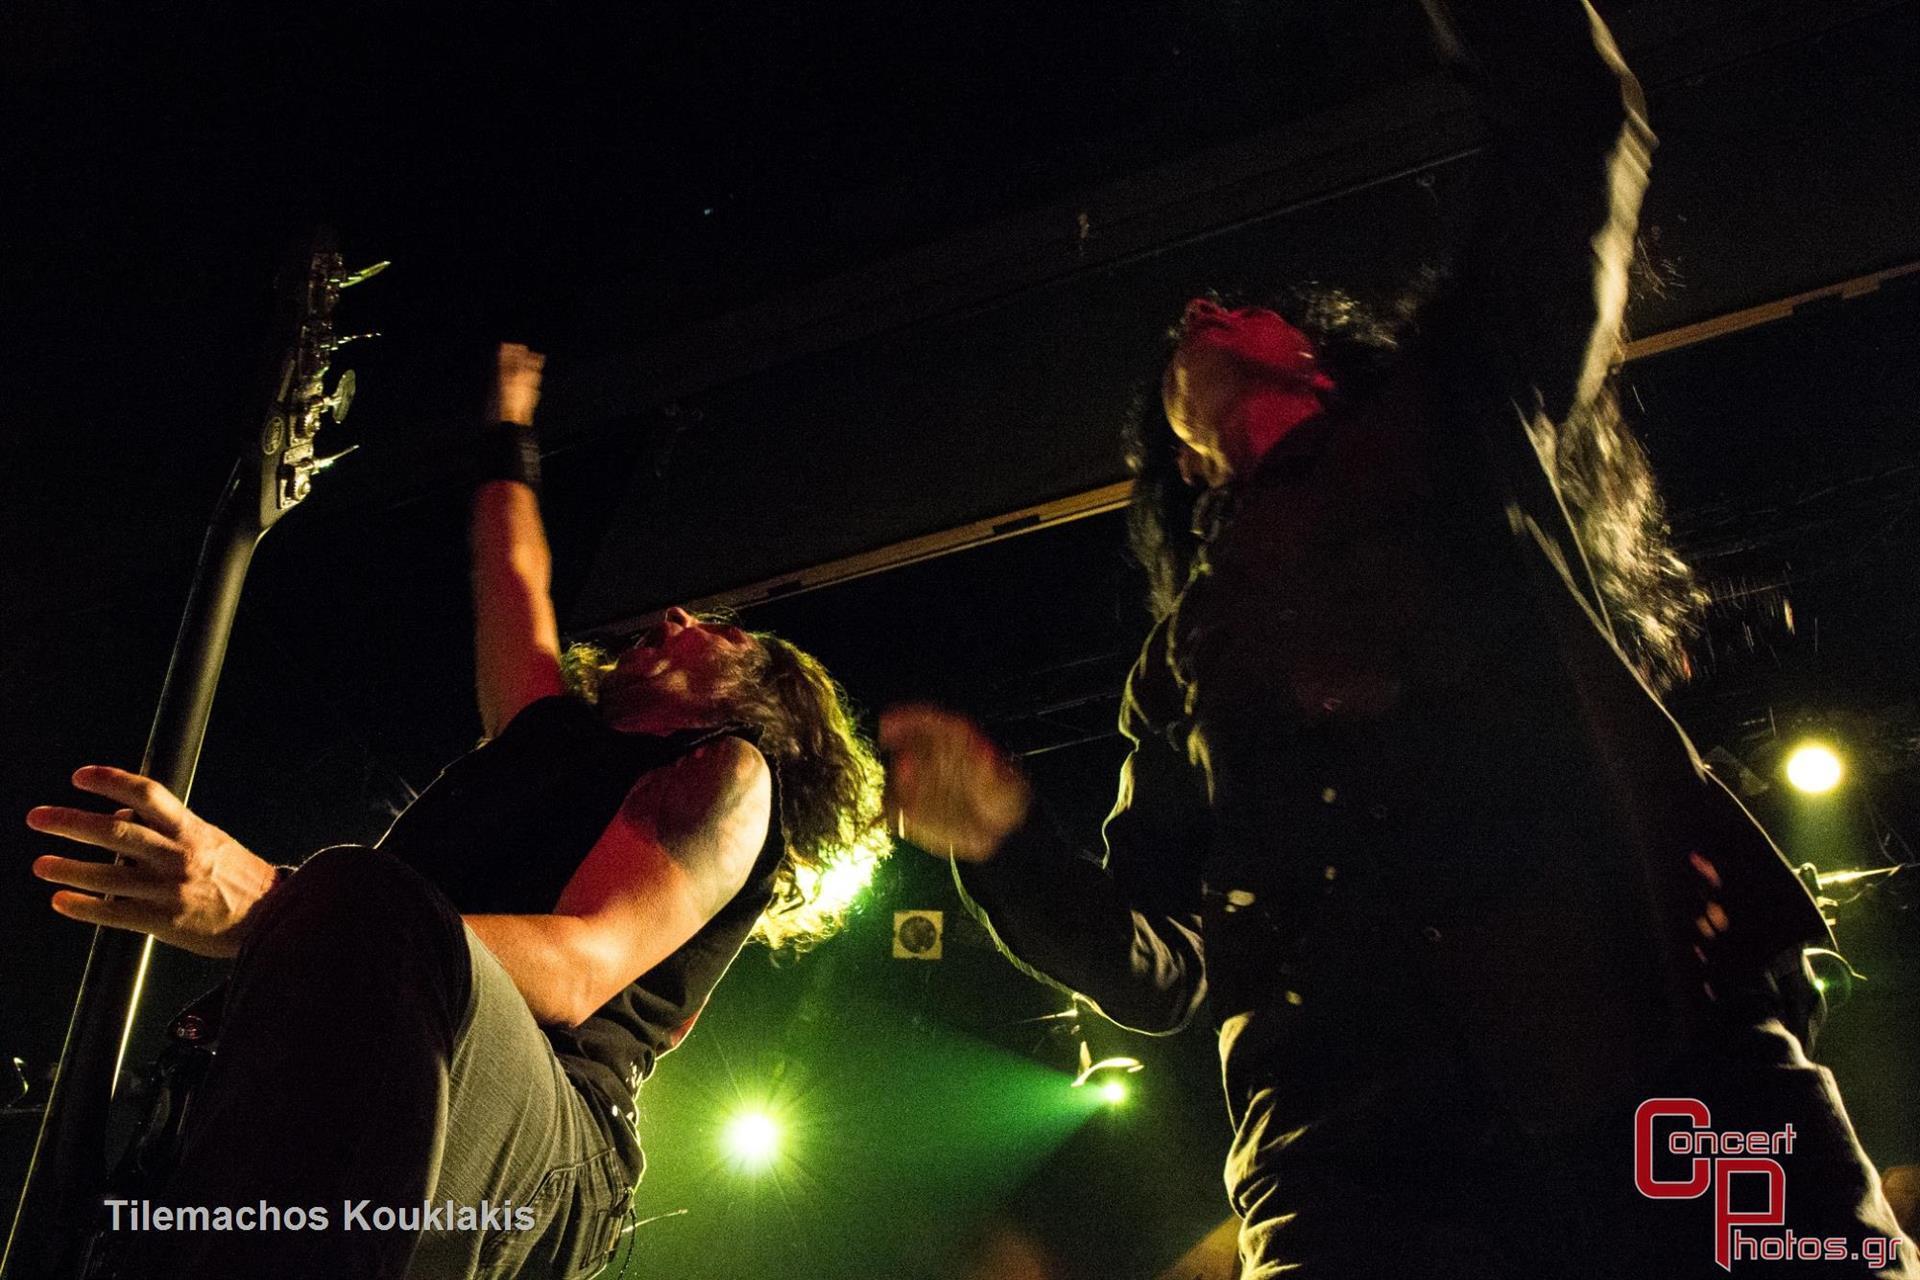 Anthrax-Anthrax photographer: Tilemachos Kouklakis - IMG_1454